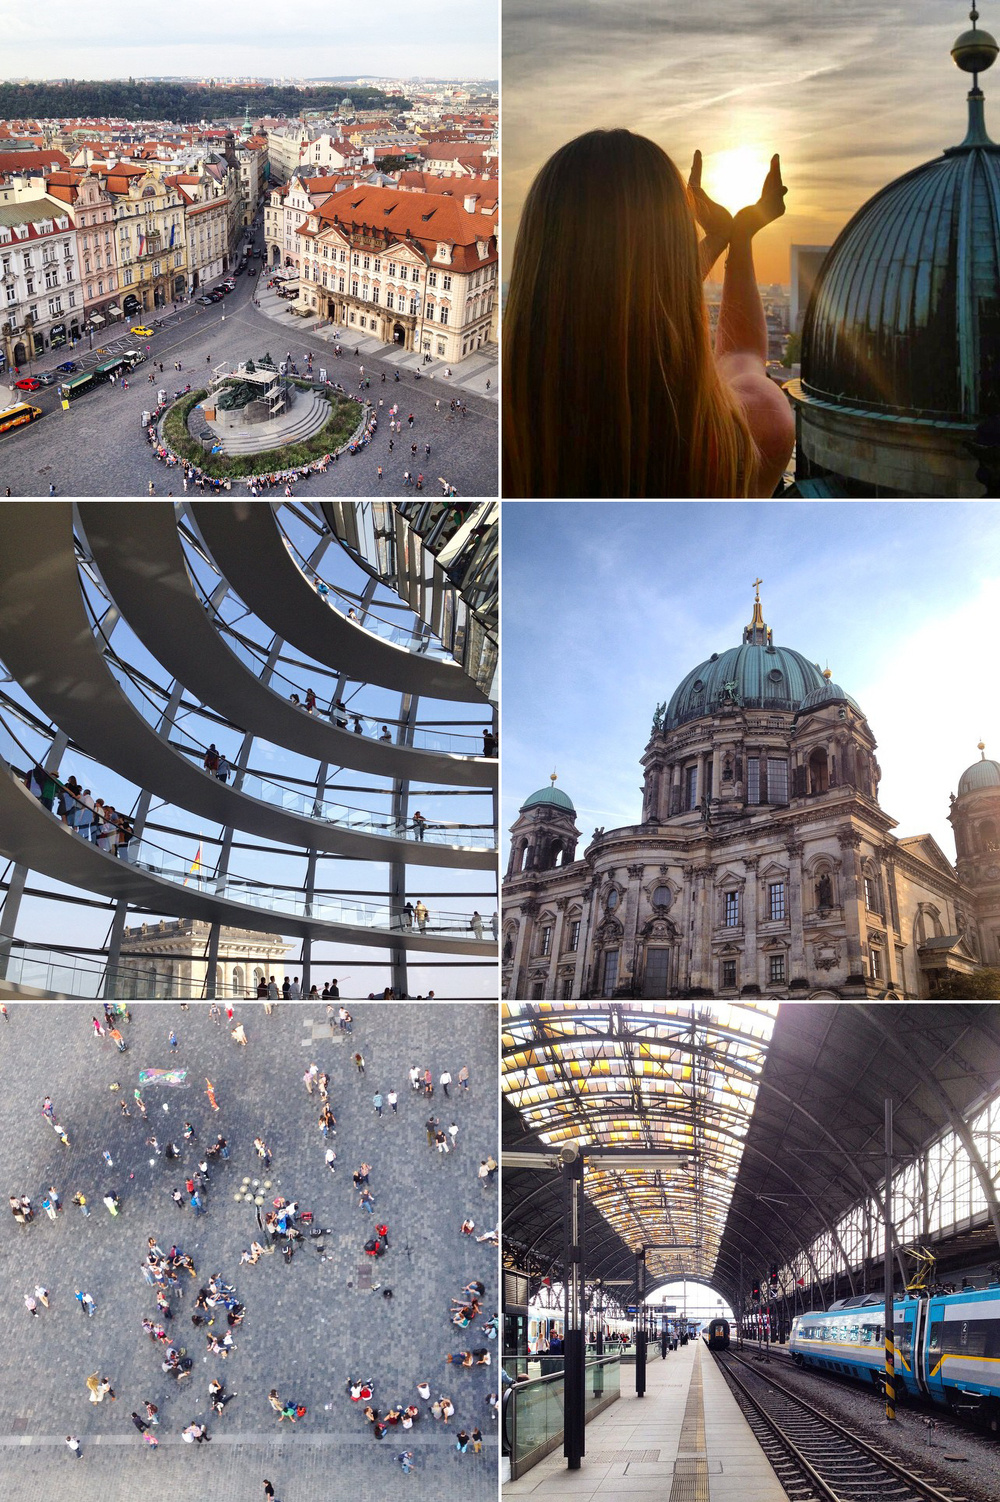 Europe photos // @tygovaars on Instagram